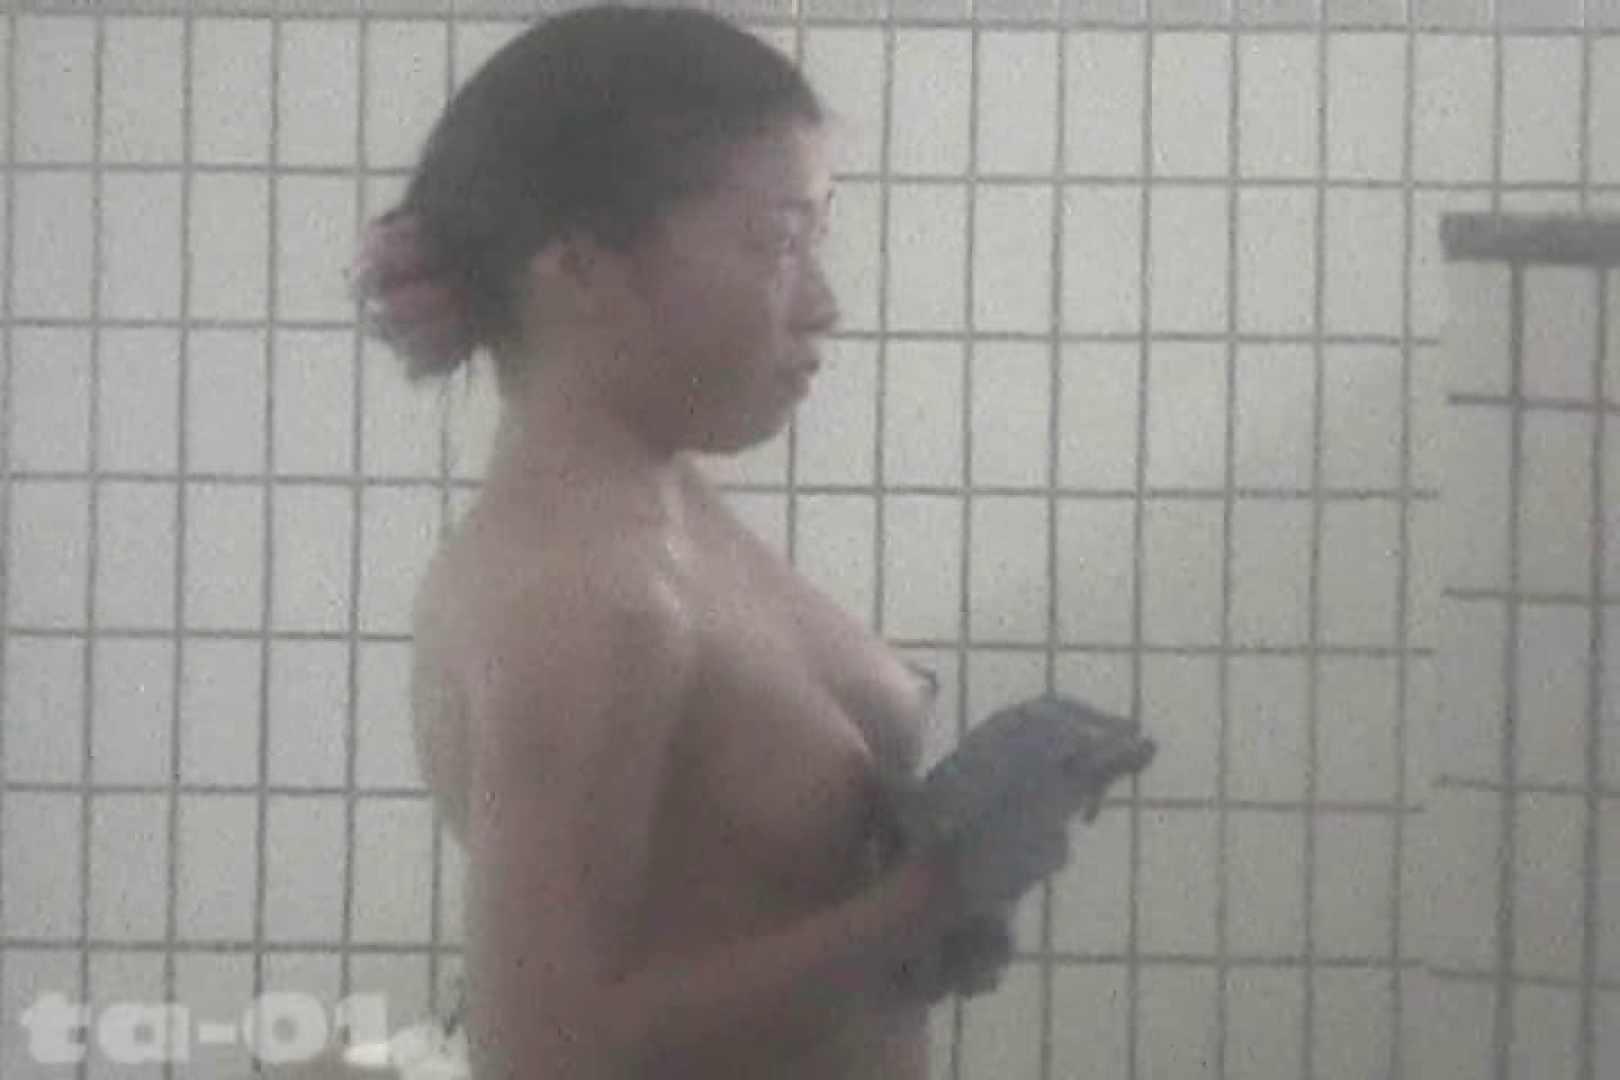 合宿ホテル女風呂盗撮高画質版 Vol.01 高画質動画  106画像 25